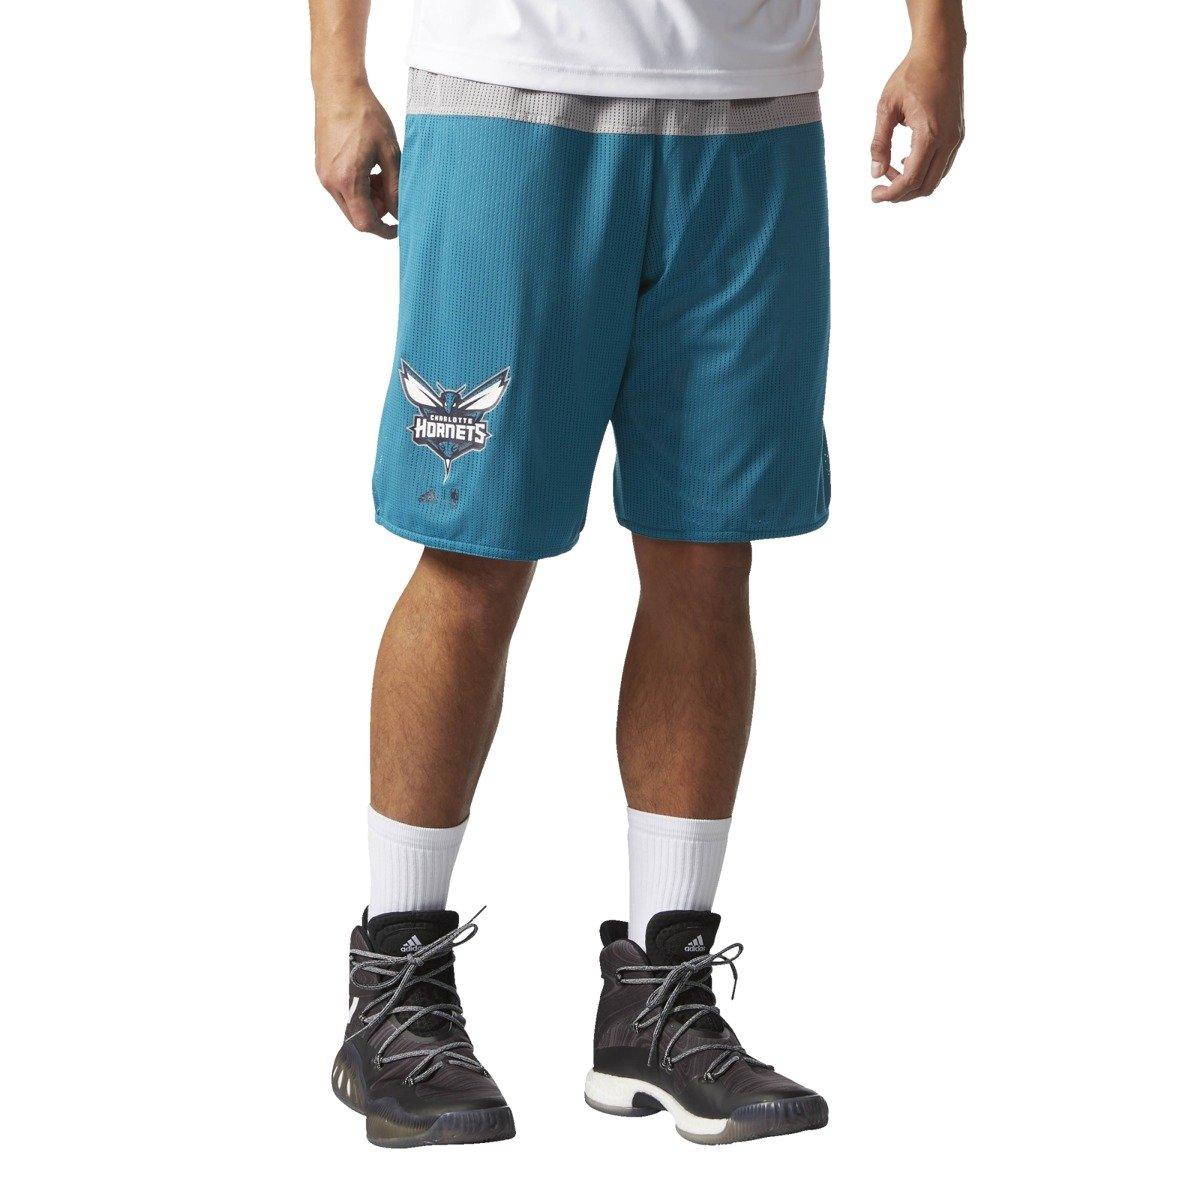 Adidas nba charlotte hornets shorts br2242 basketball for Custom dress shirts charlotte nc